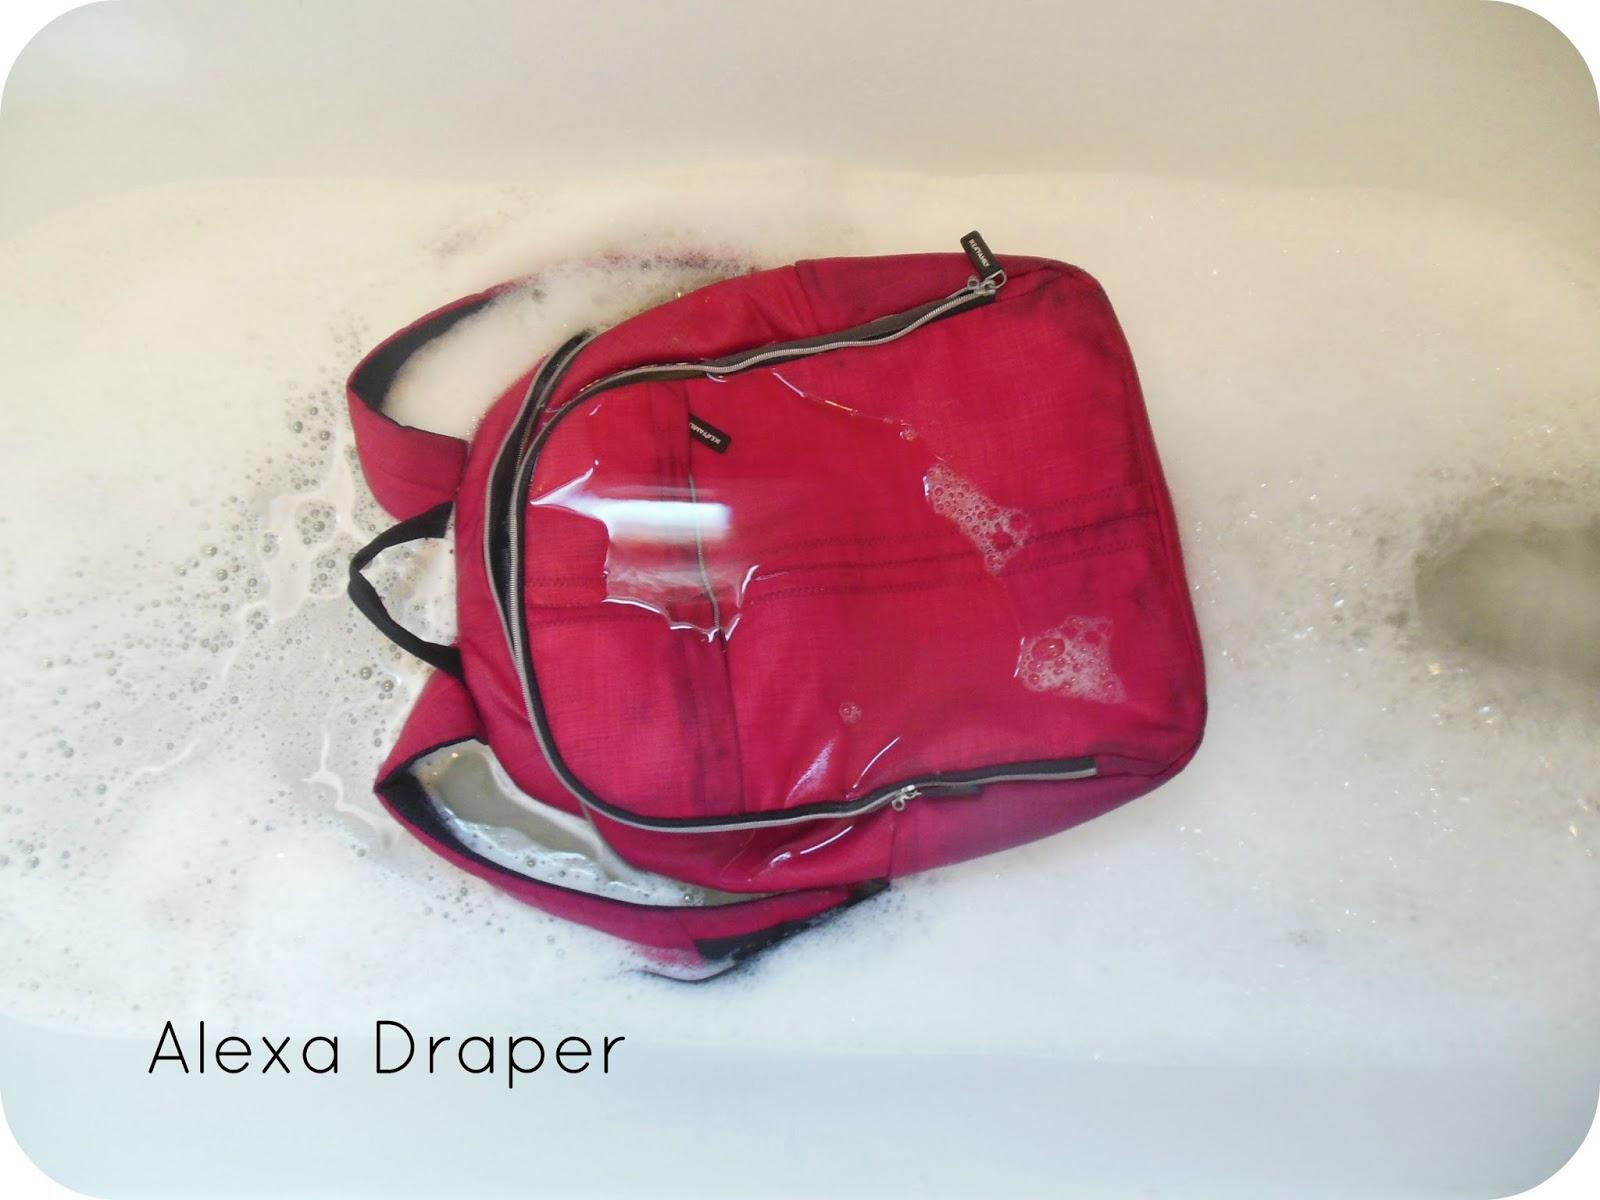 Alexa Draper: 2015